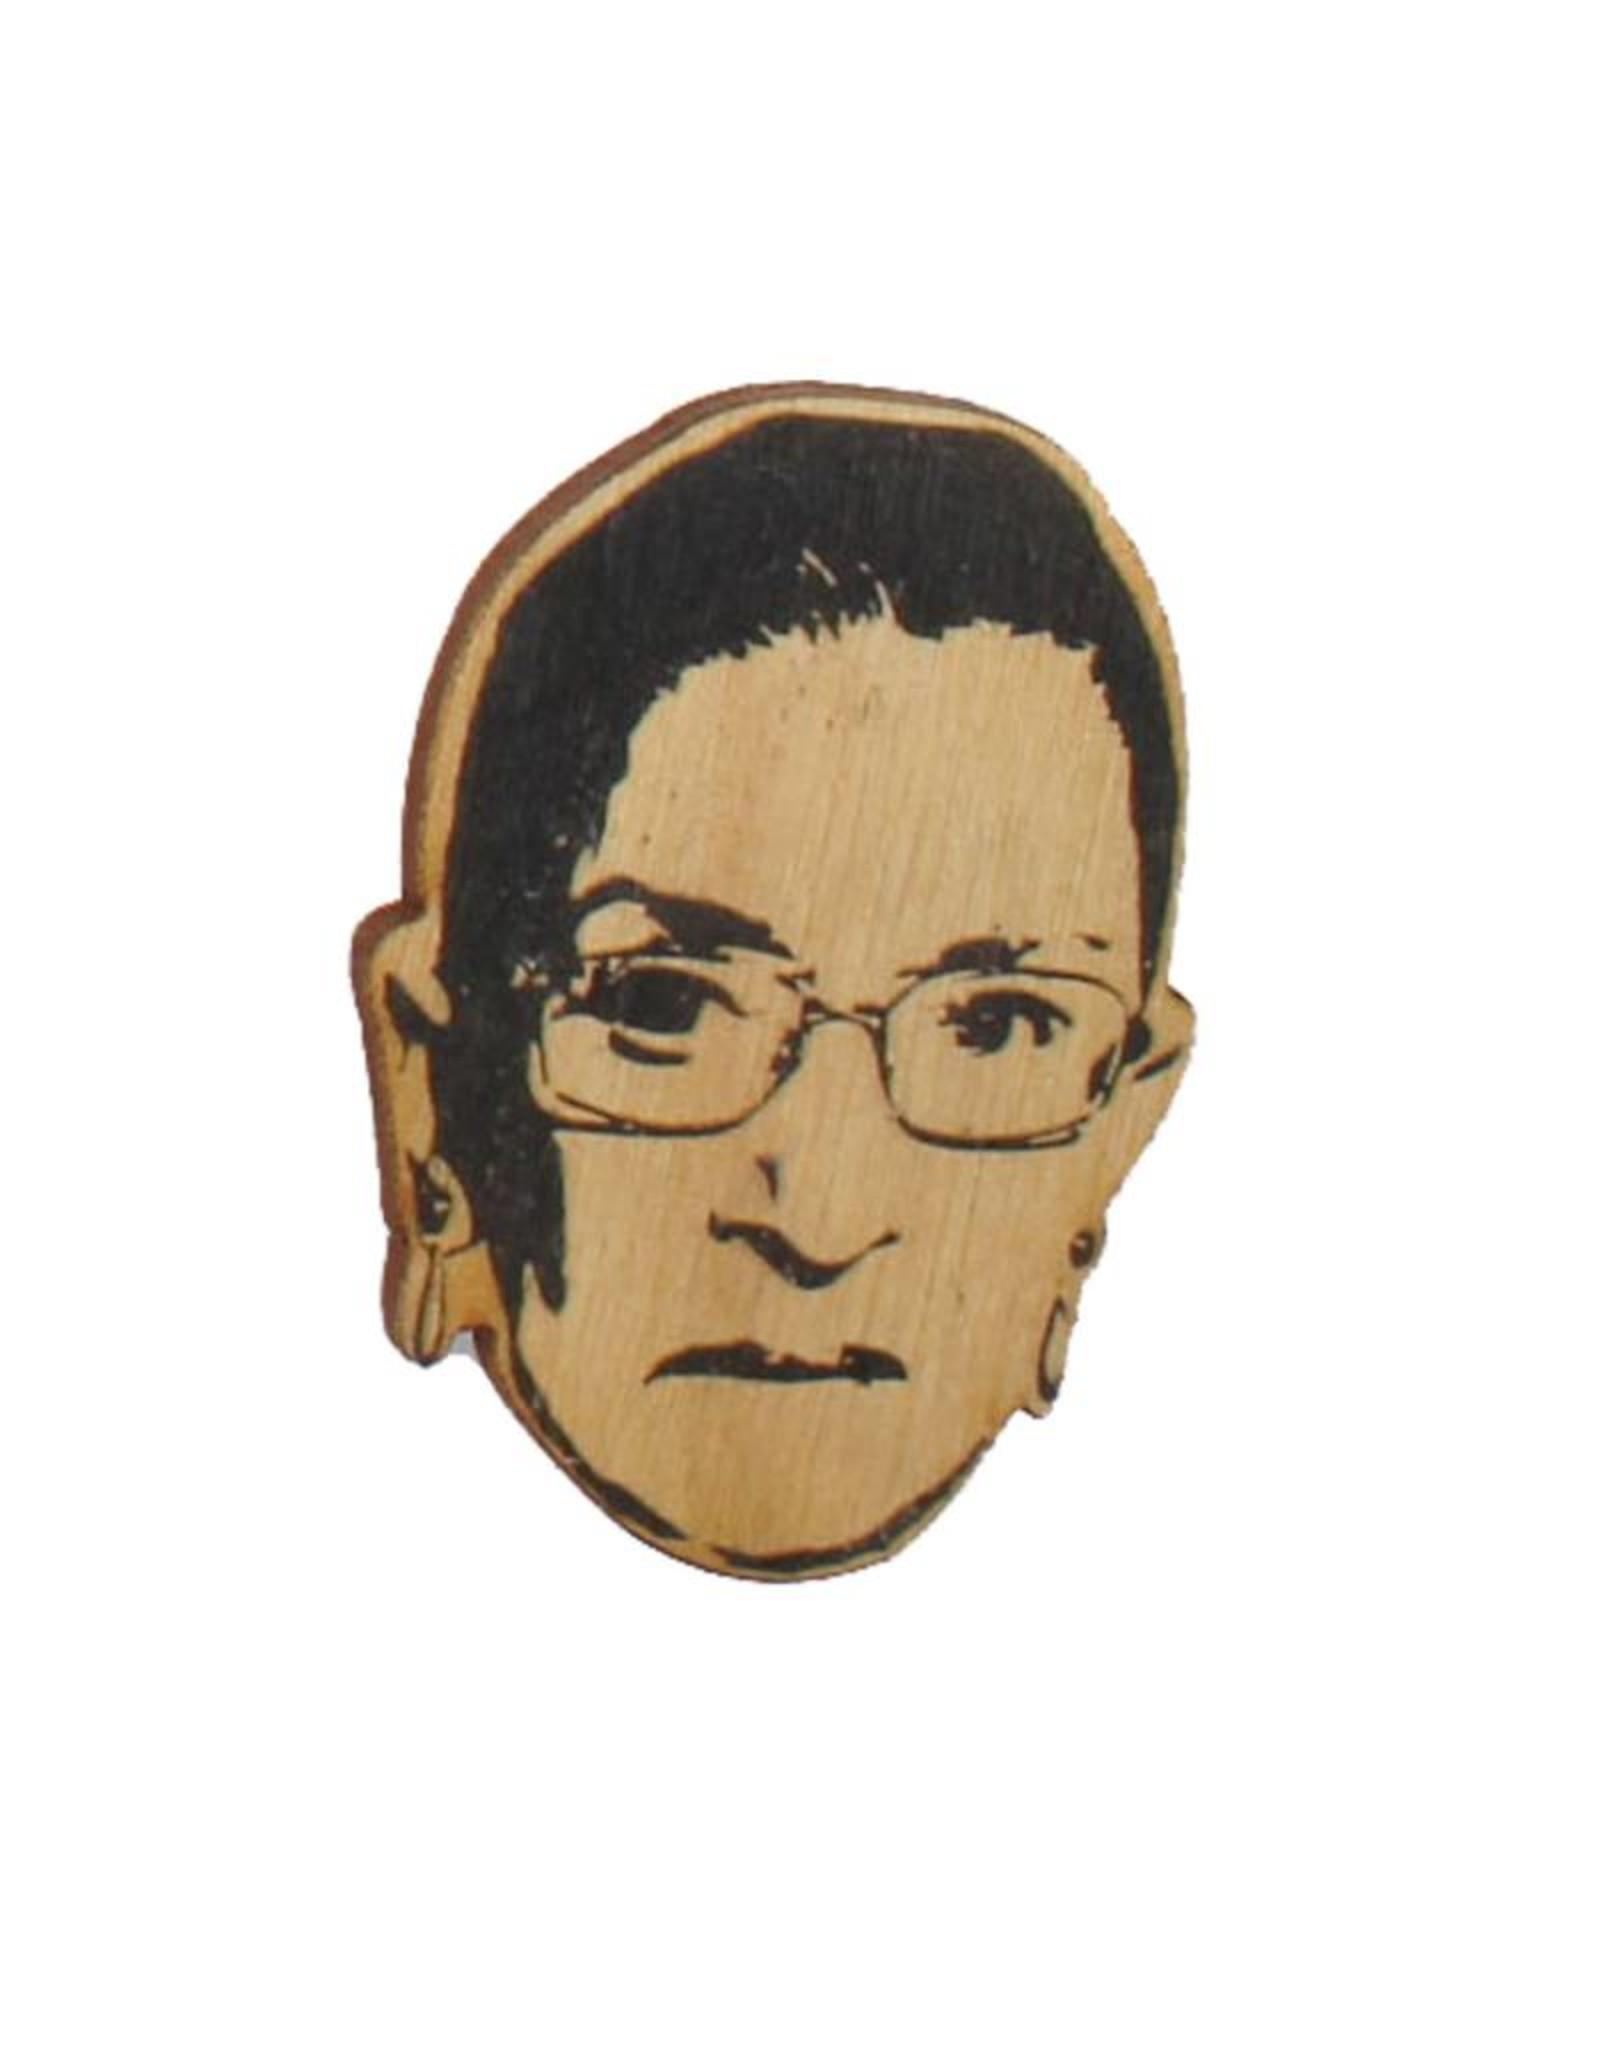 Ruth Bader Ginsburg RGB Wooden Magnet